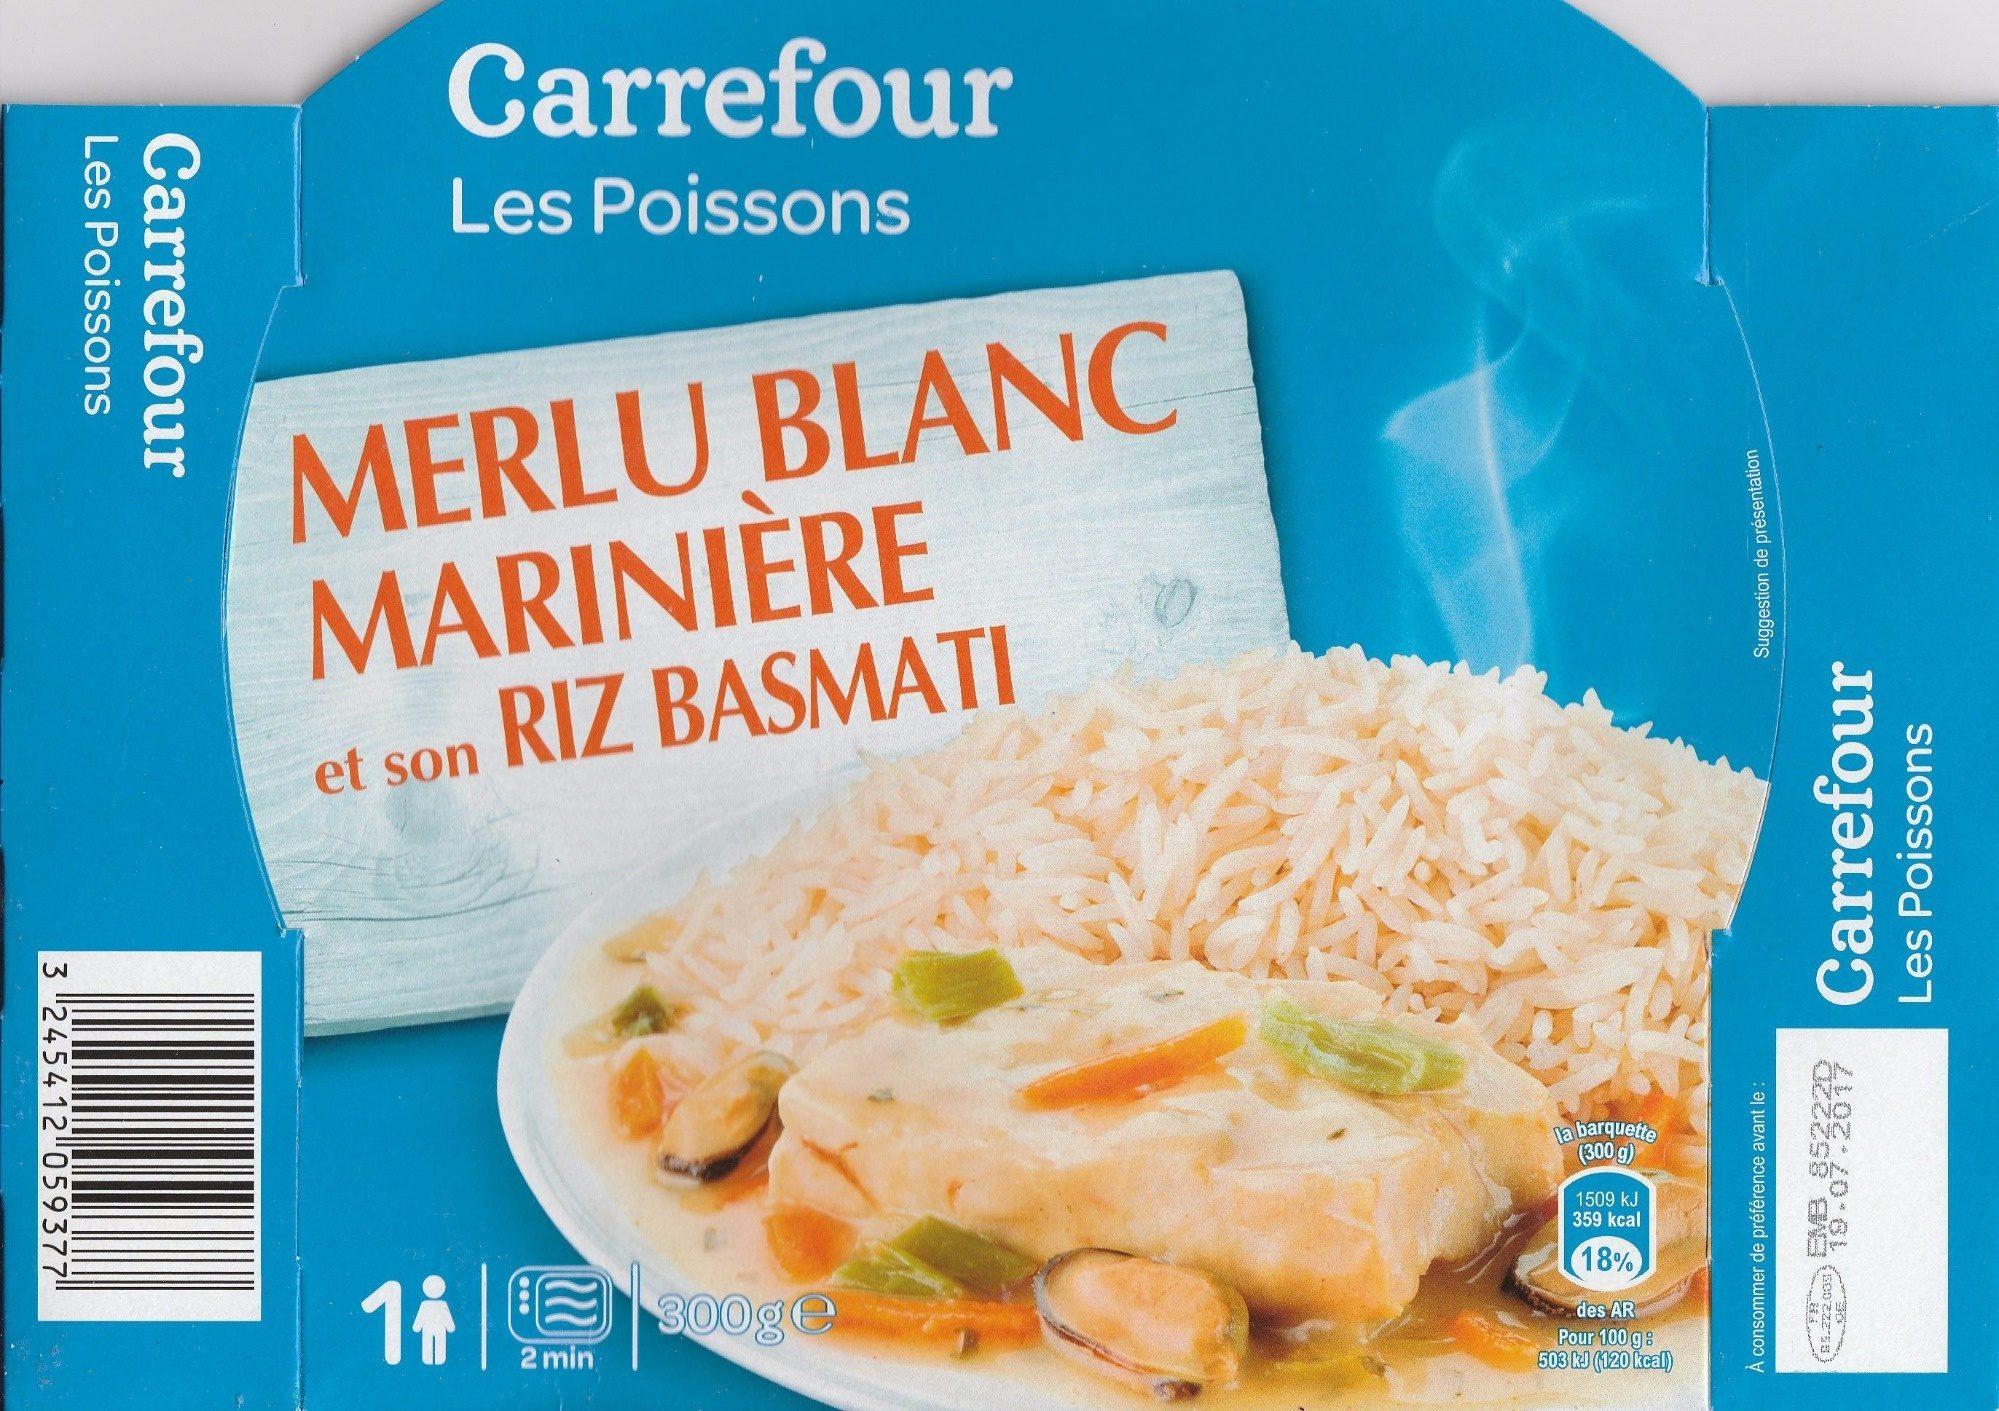 Merlu blanc marini re et son riz basmati carrefour 300 g - Balance de cuisine carrefour ...